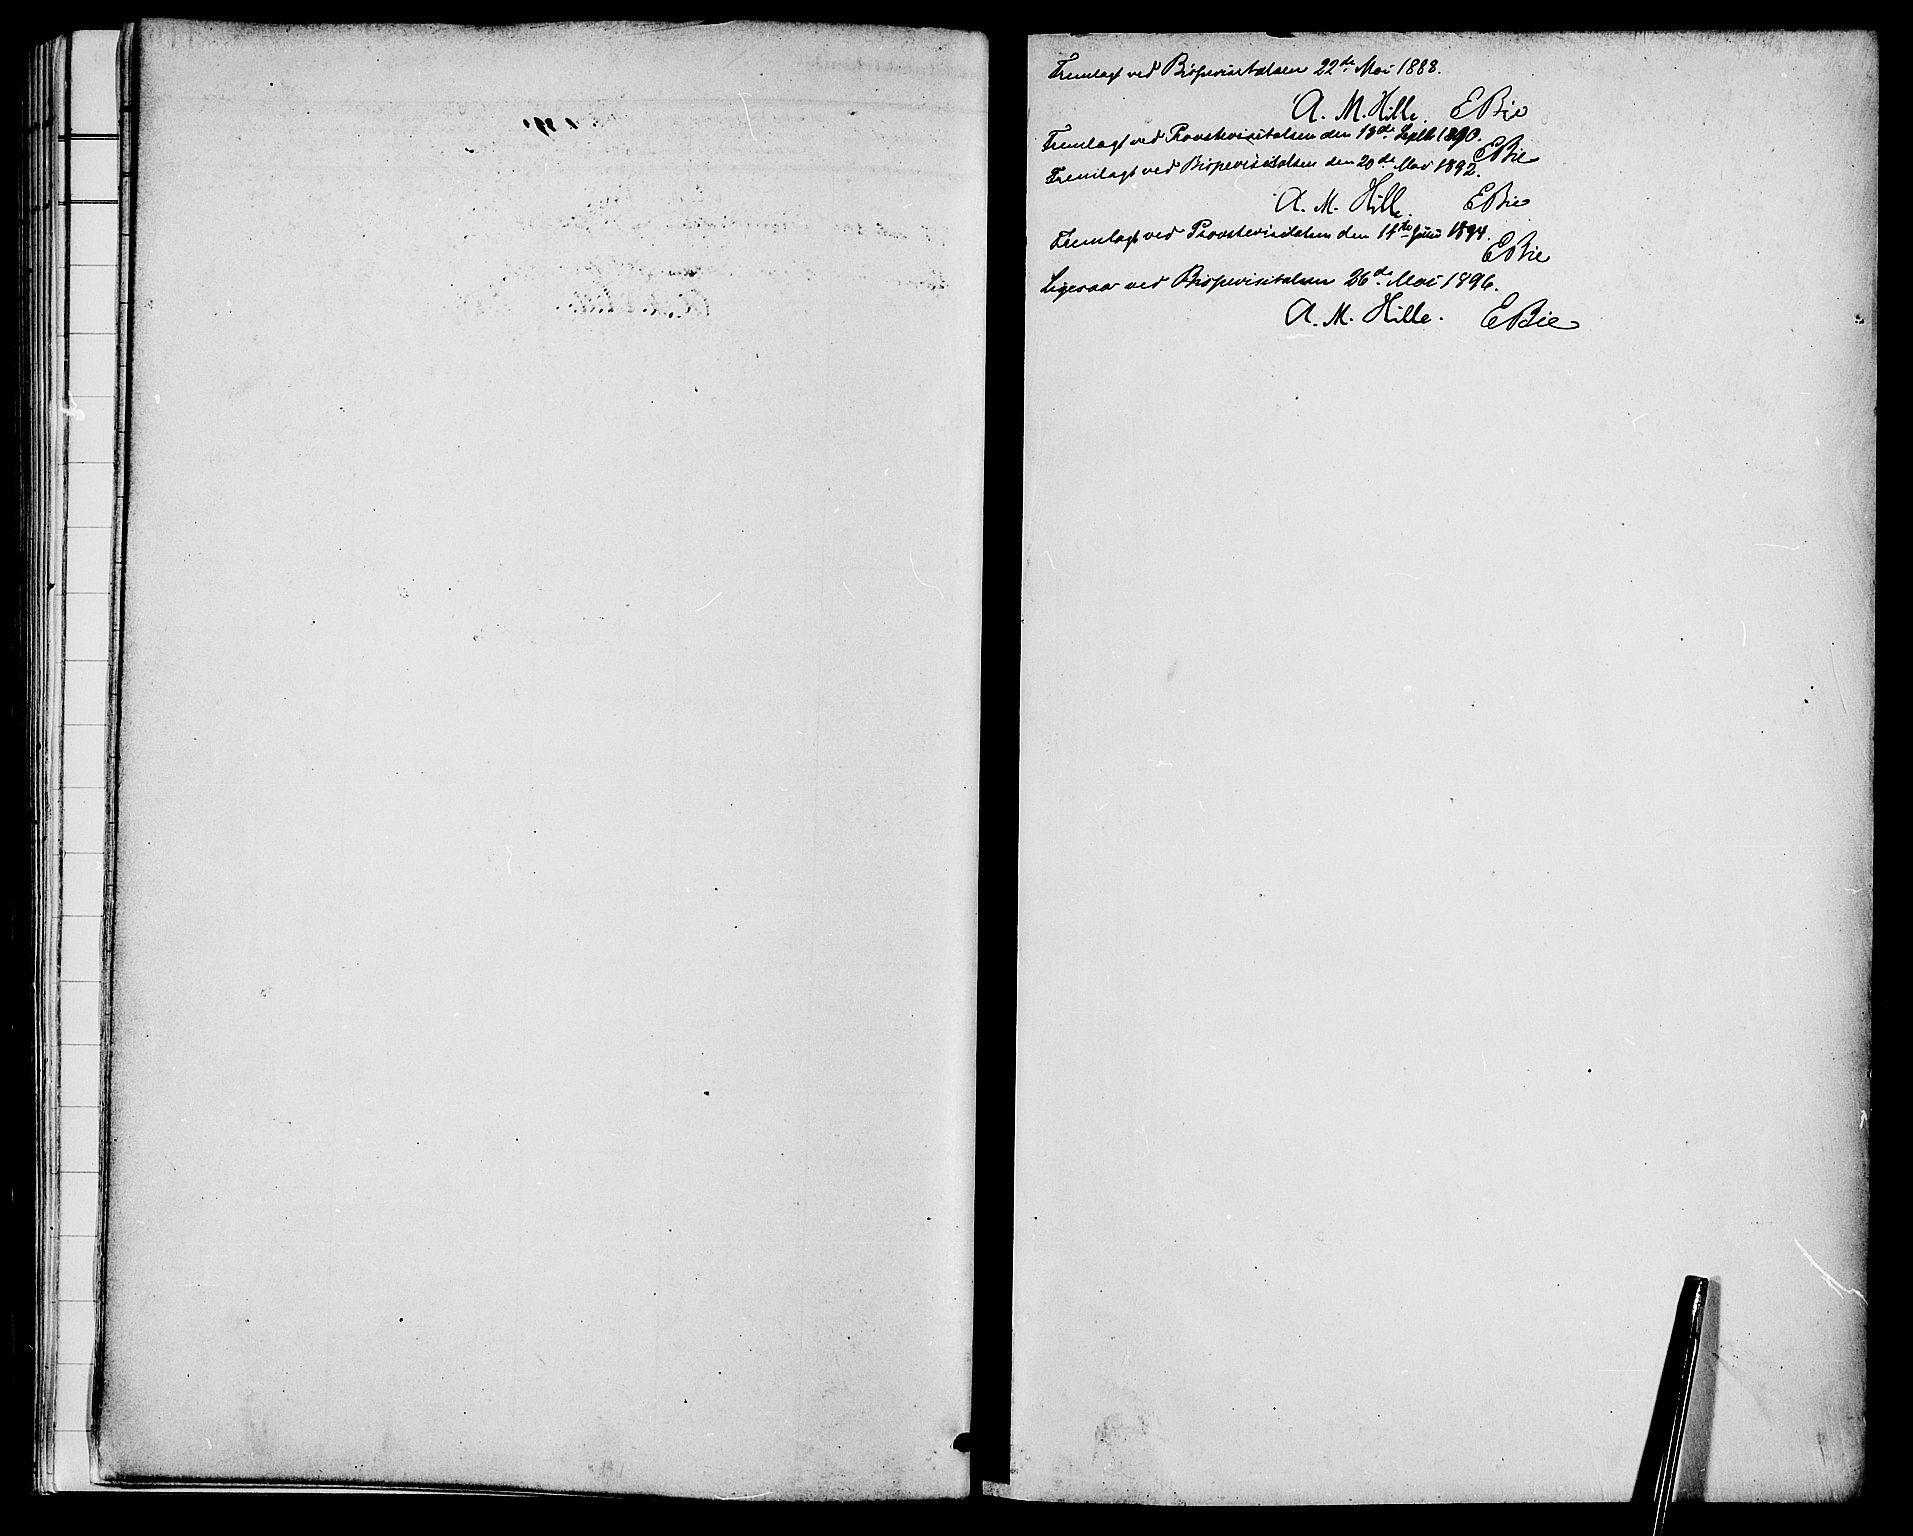 SAH, Biri prestekontor, Ministerialbok nr. 7, 1887-1893